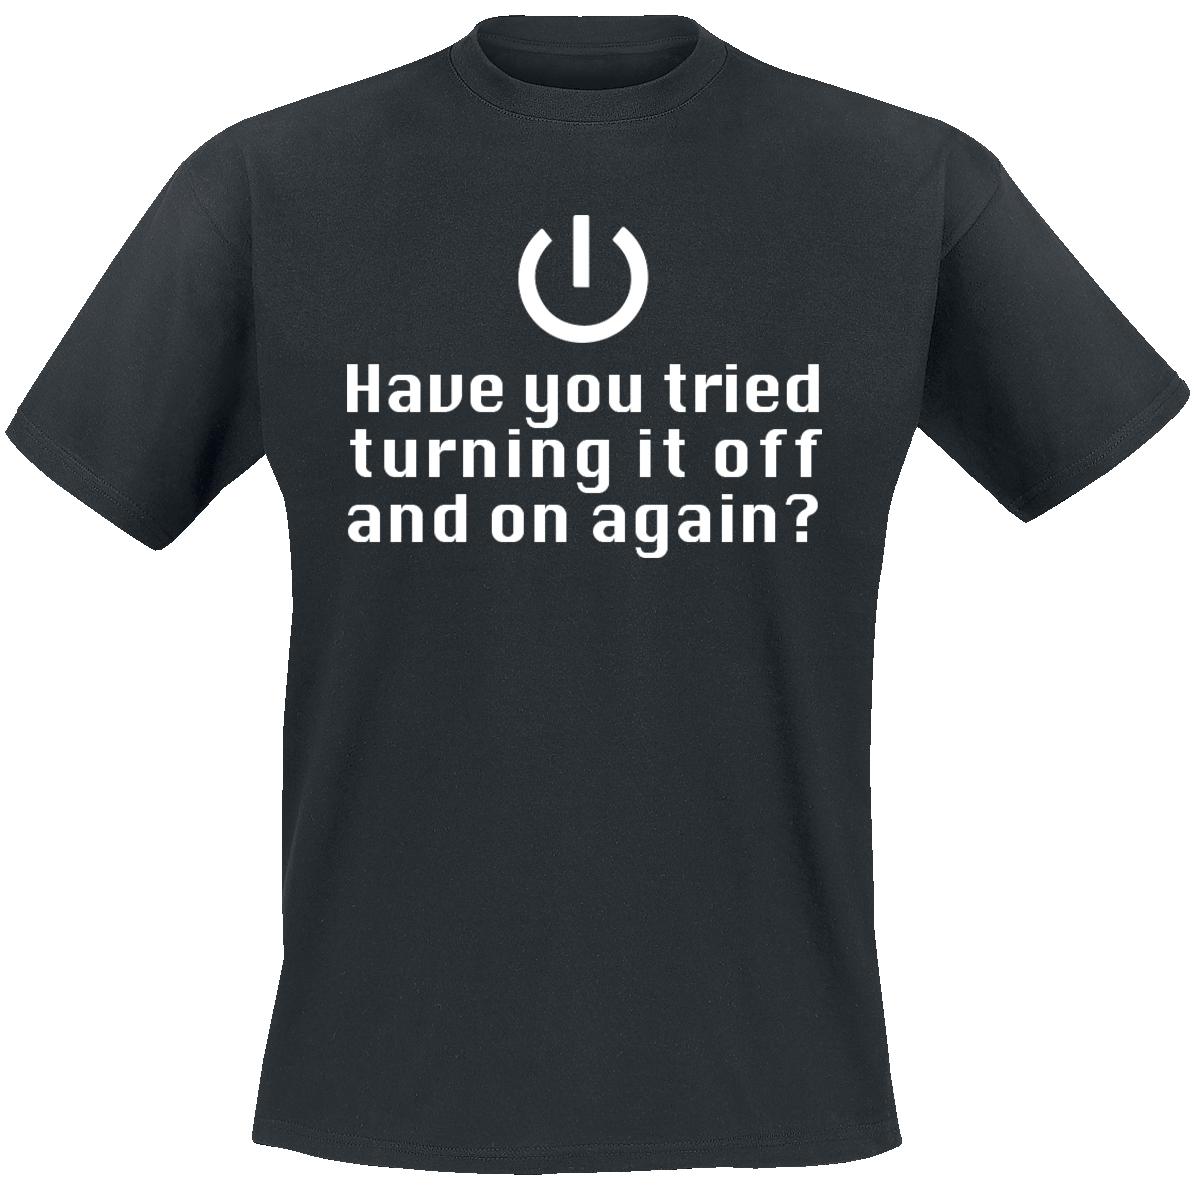 Turning It Off -  - T-Shirt - black image